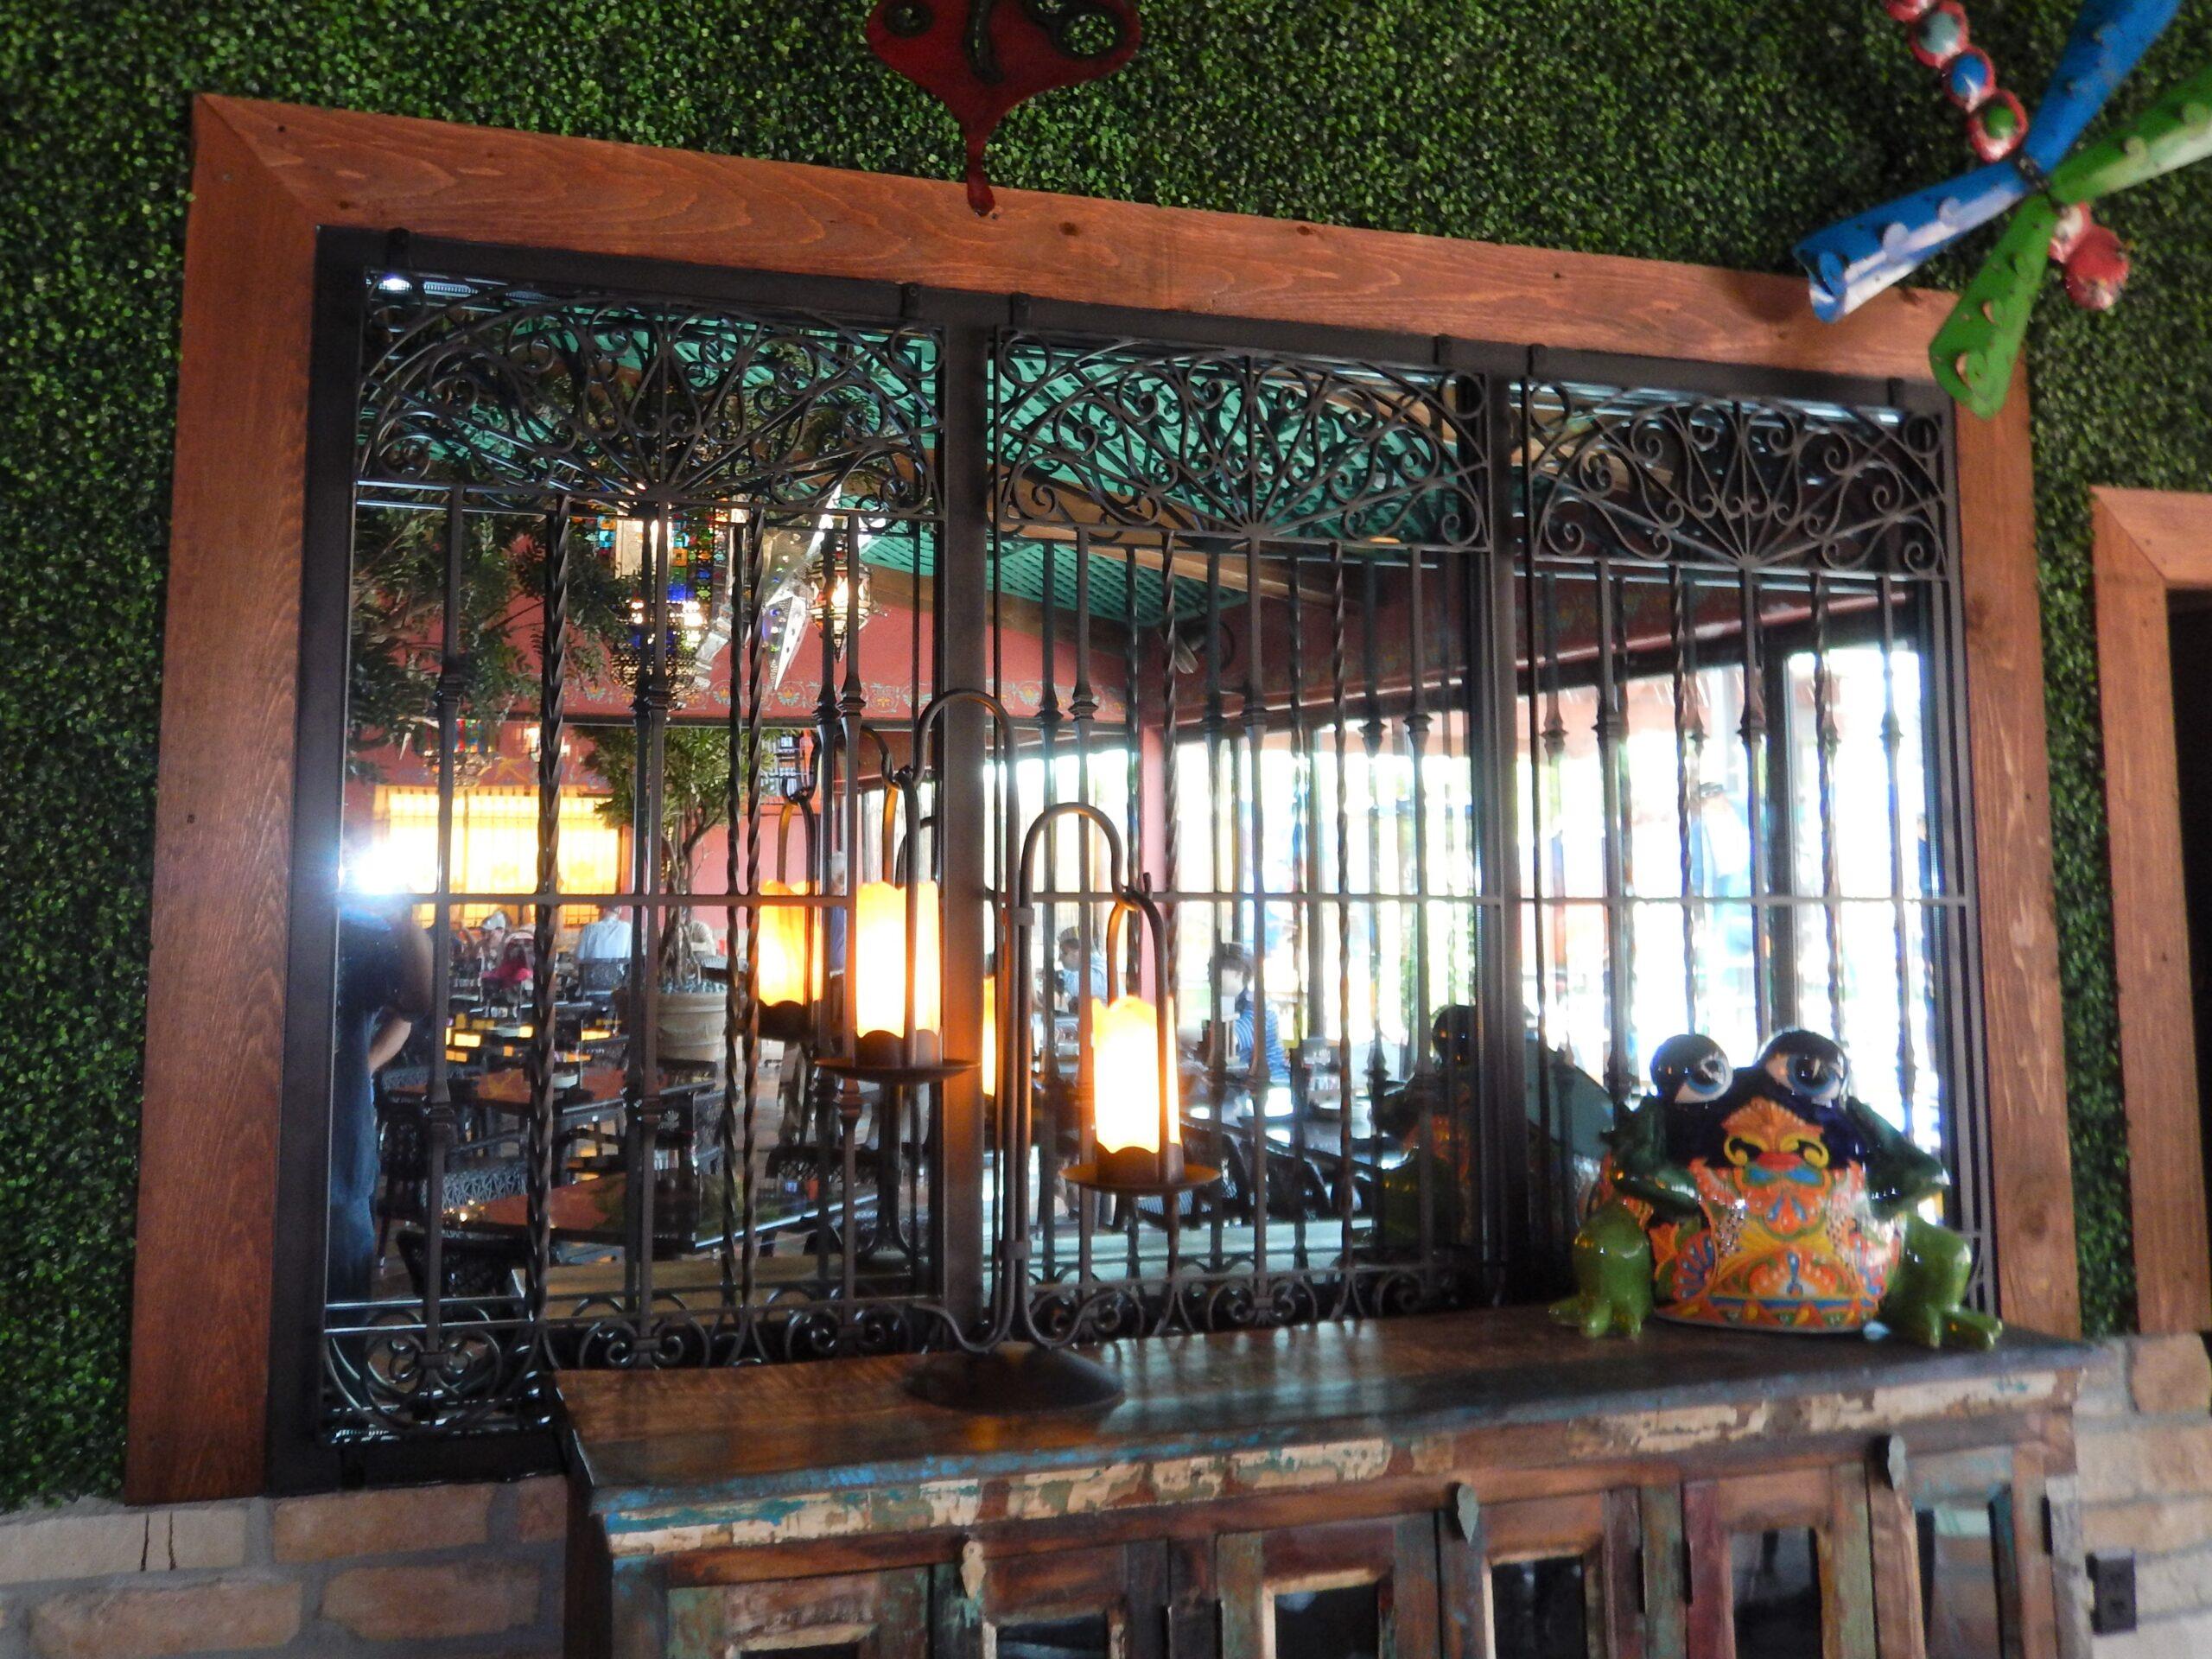 Miguel's-Restaurant-Midland-TX-Steel-commercial-Main-Door-Entry-windows-railings-lighting-Avanti-OLS-MOD-B003 (19)